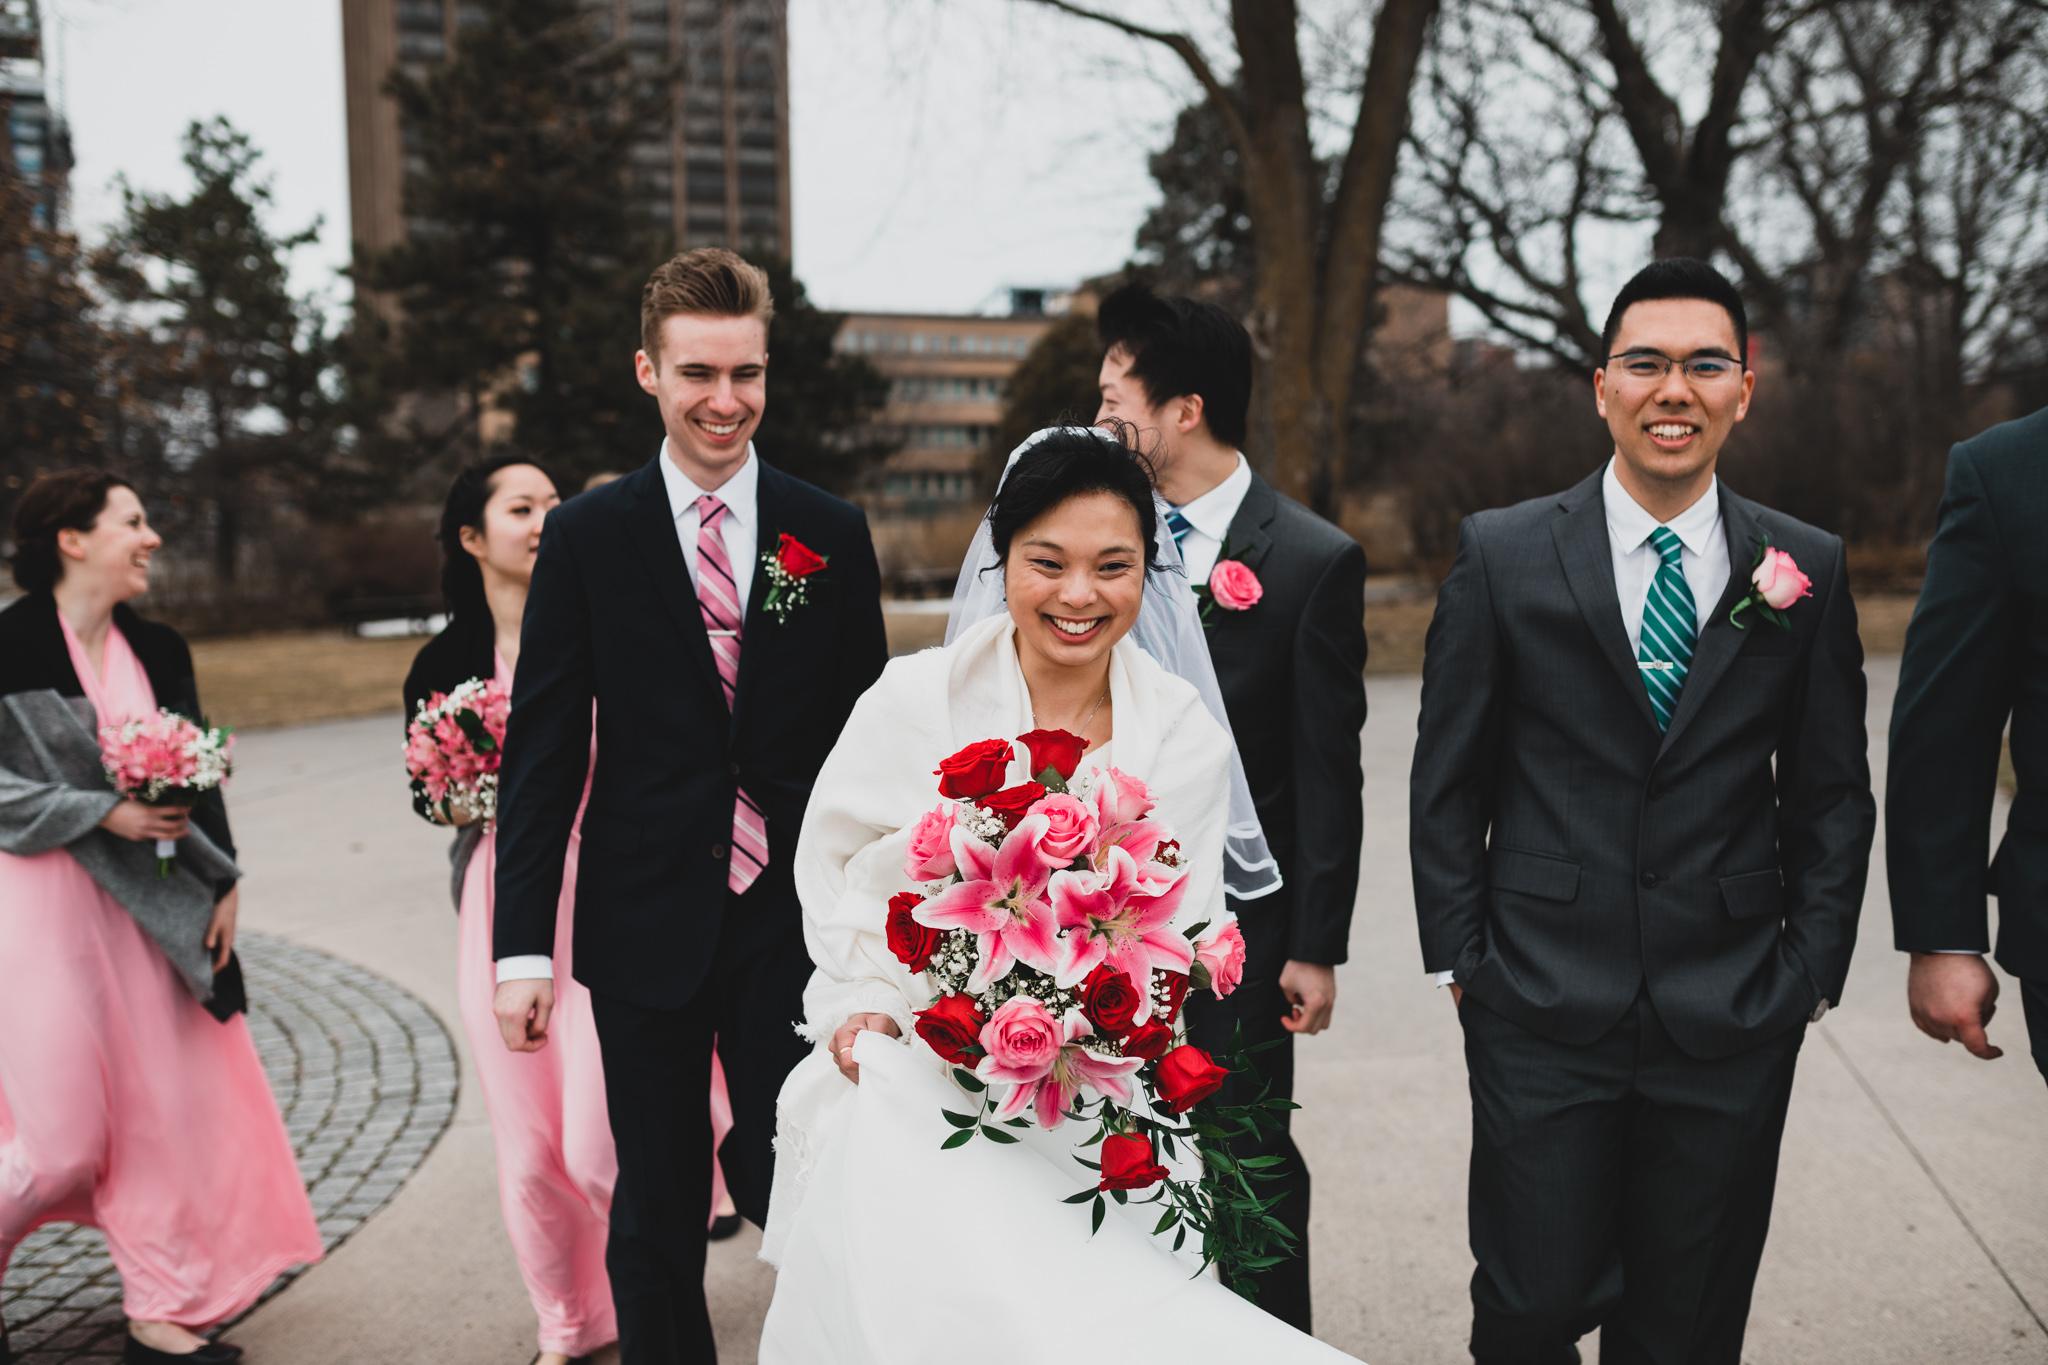 434-WEB-Jonathan-Kuhn-Photography-Alicia-Gabe-Wedding-3716.jpg